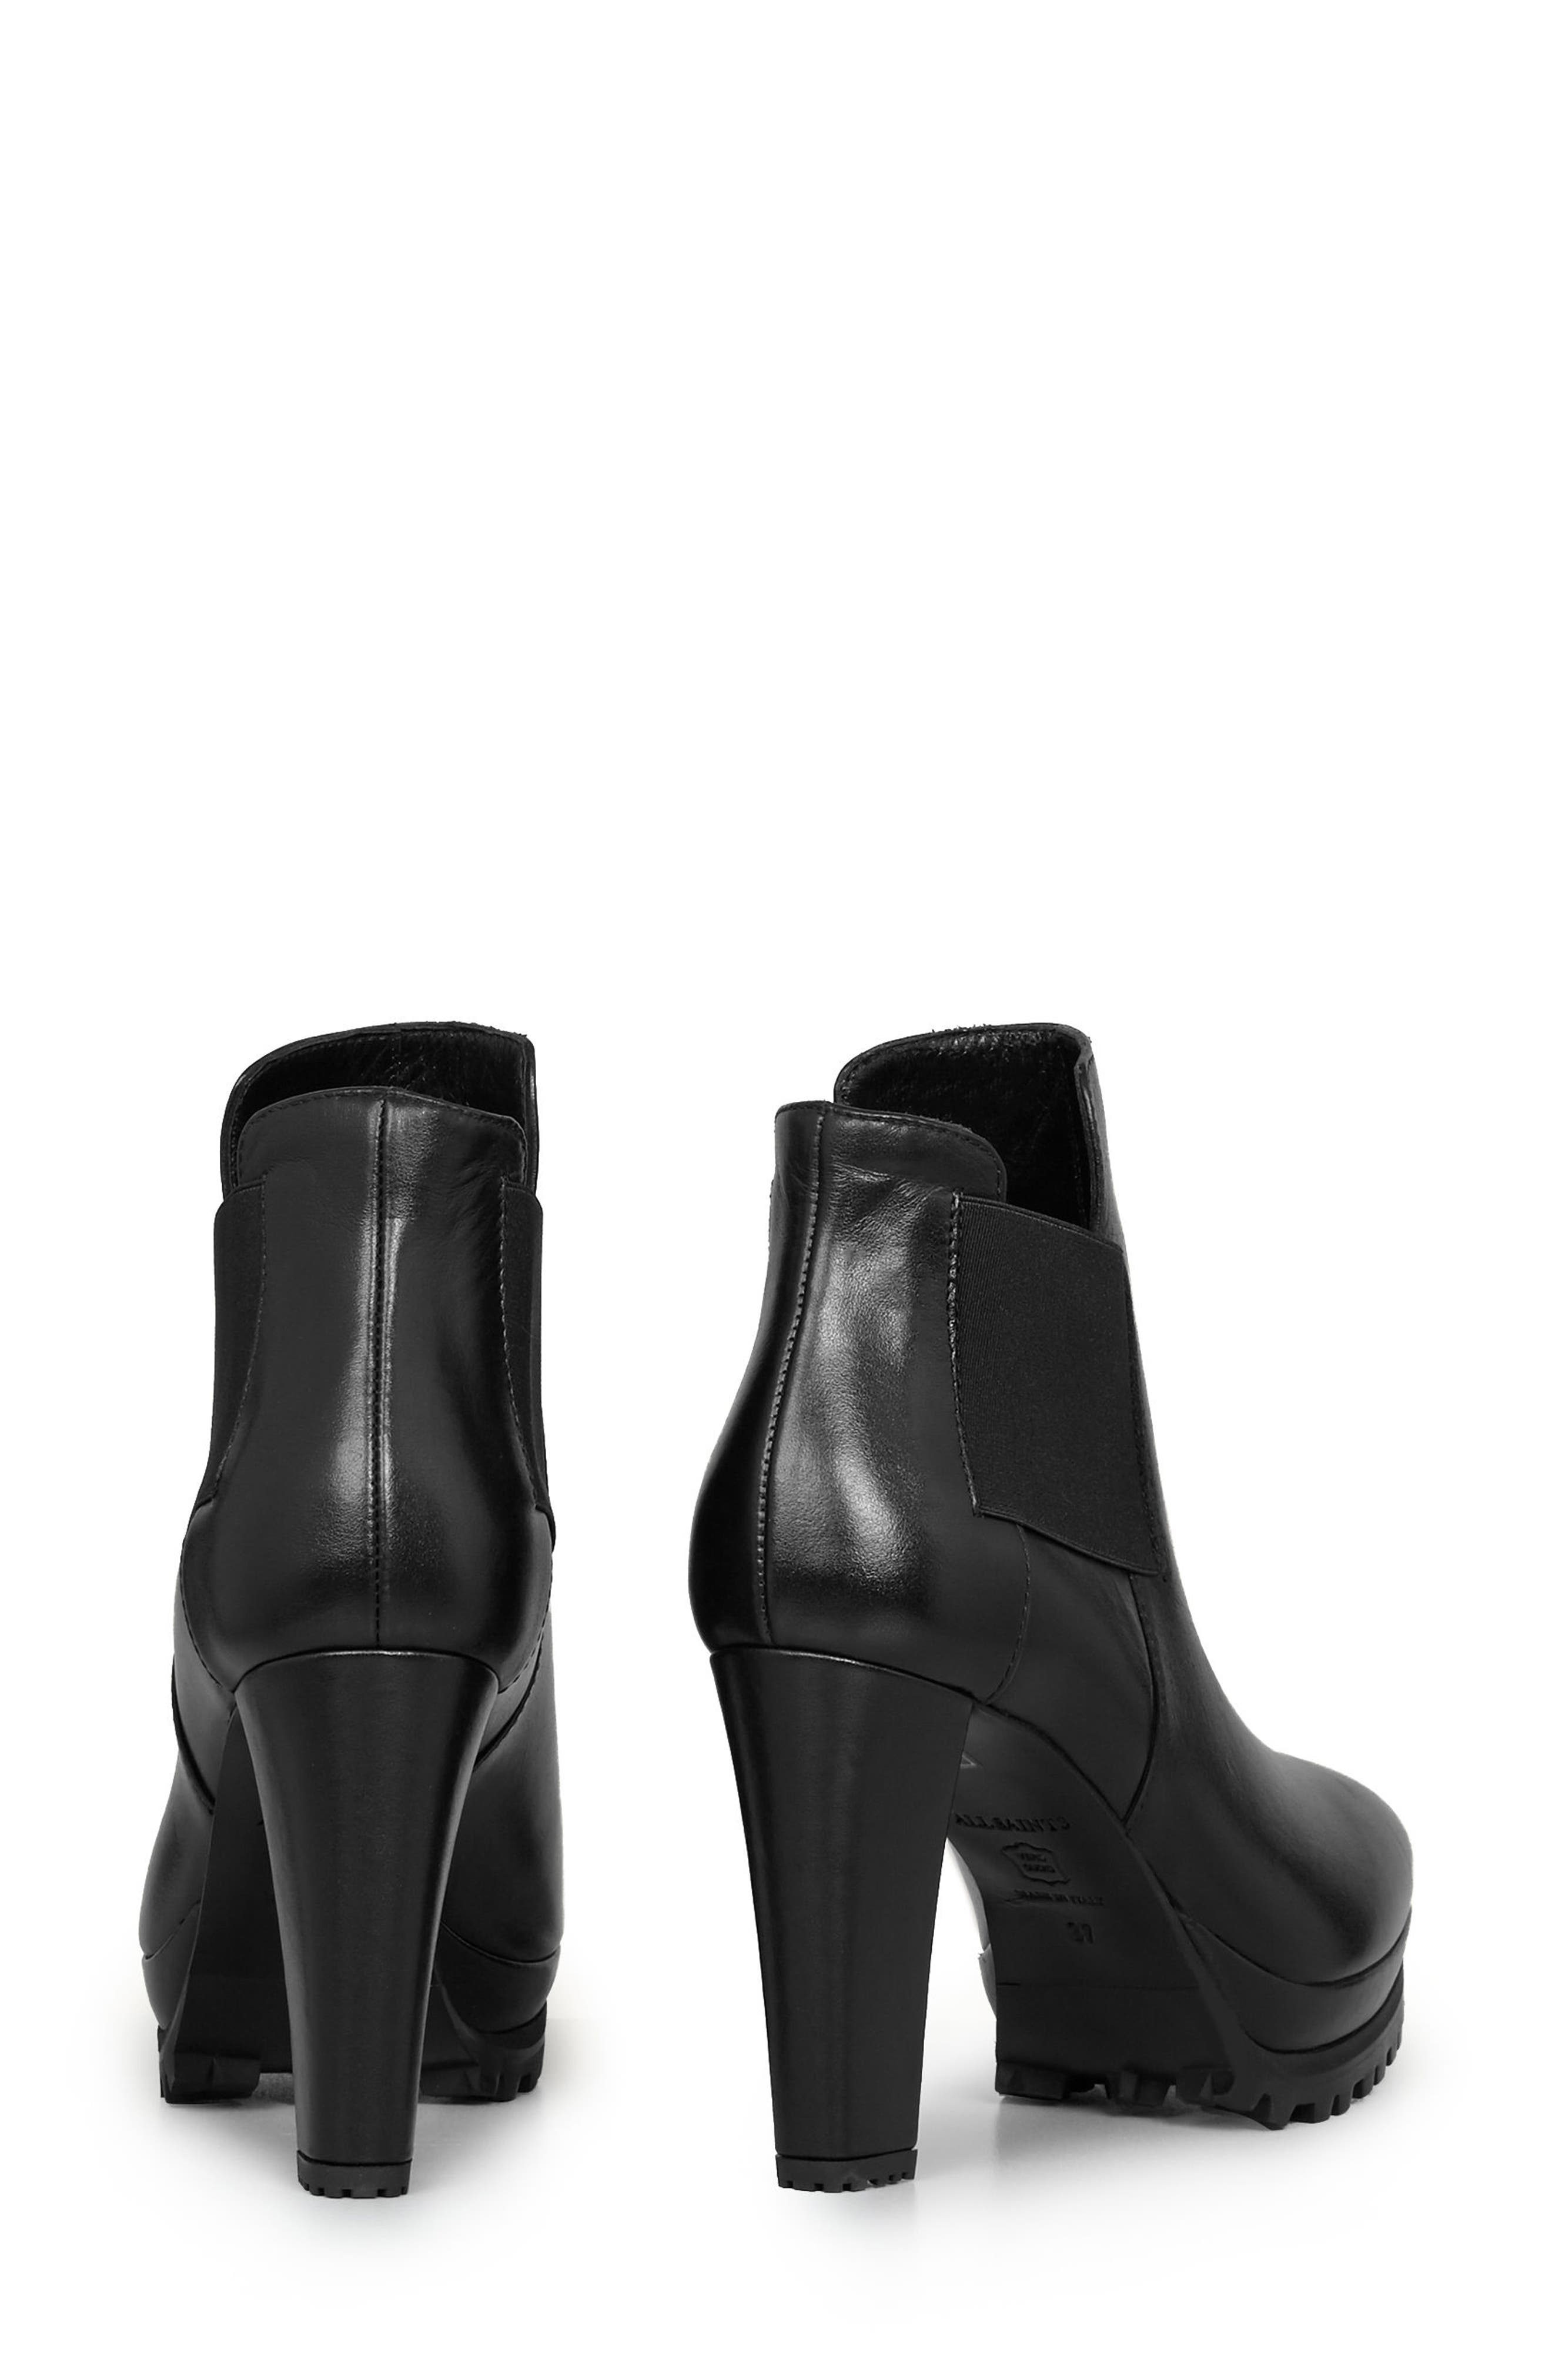 5cf6210e4ef Women s Boots Sale